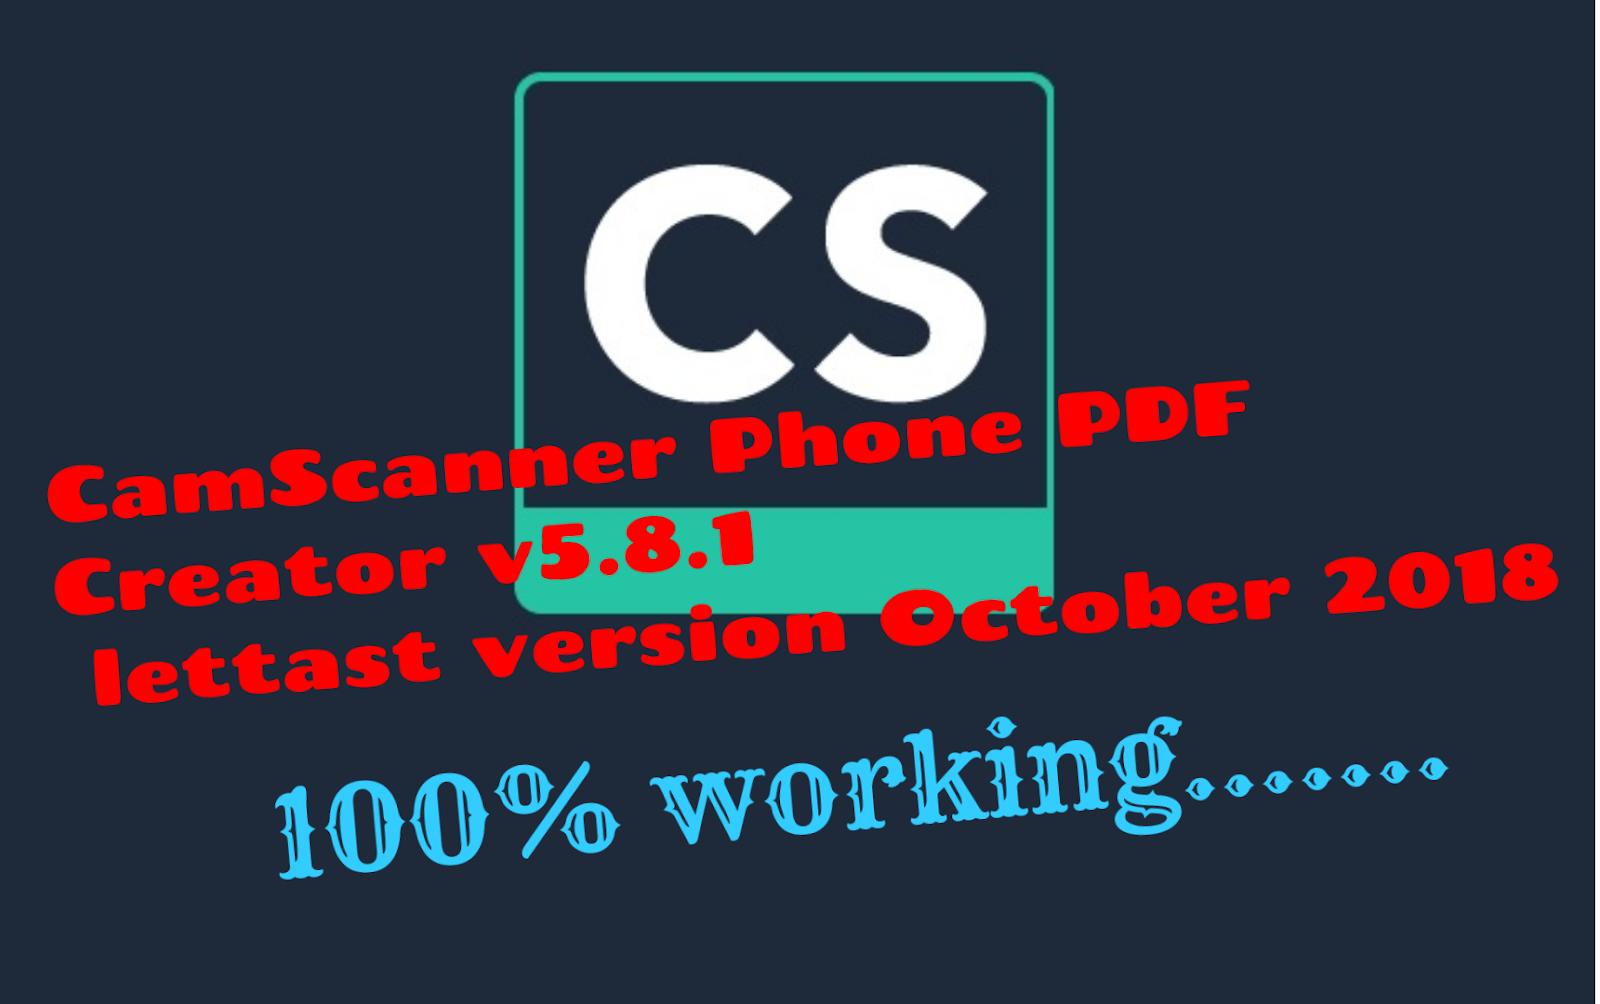 JoMobileTech: CamScanner Phone PDF Creator v5 8 1 & v-5 8 3 UNLOCKED APK